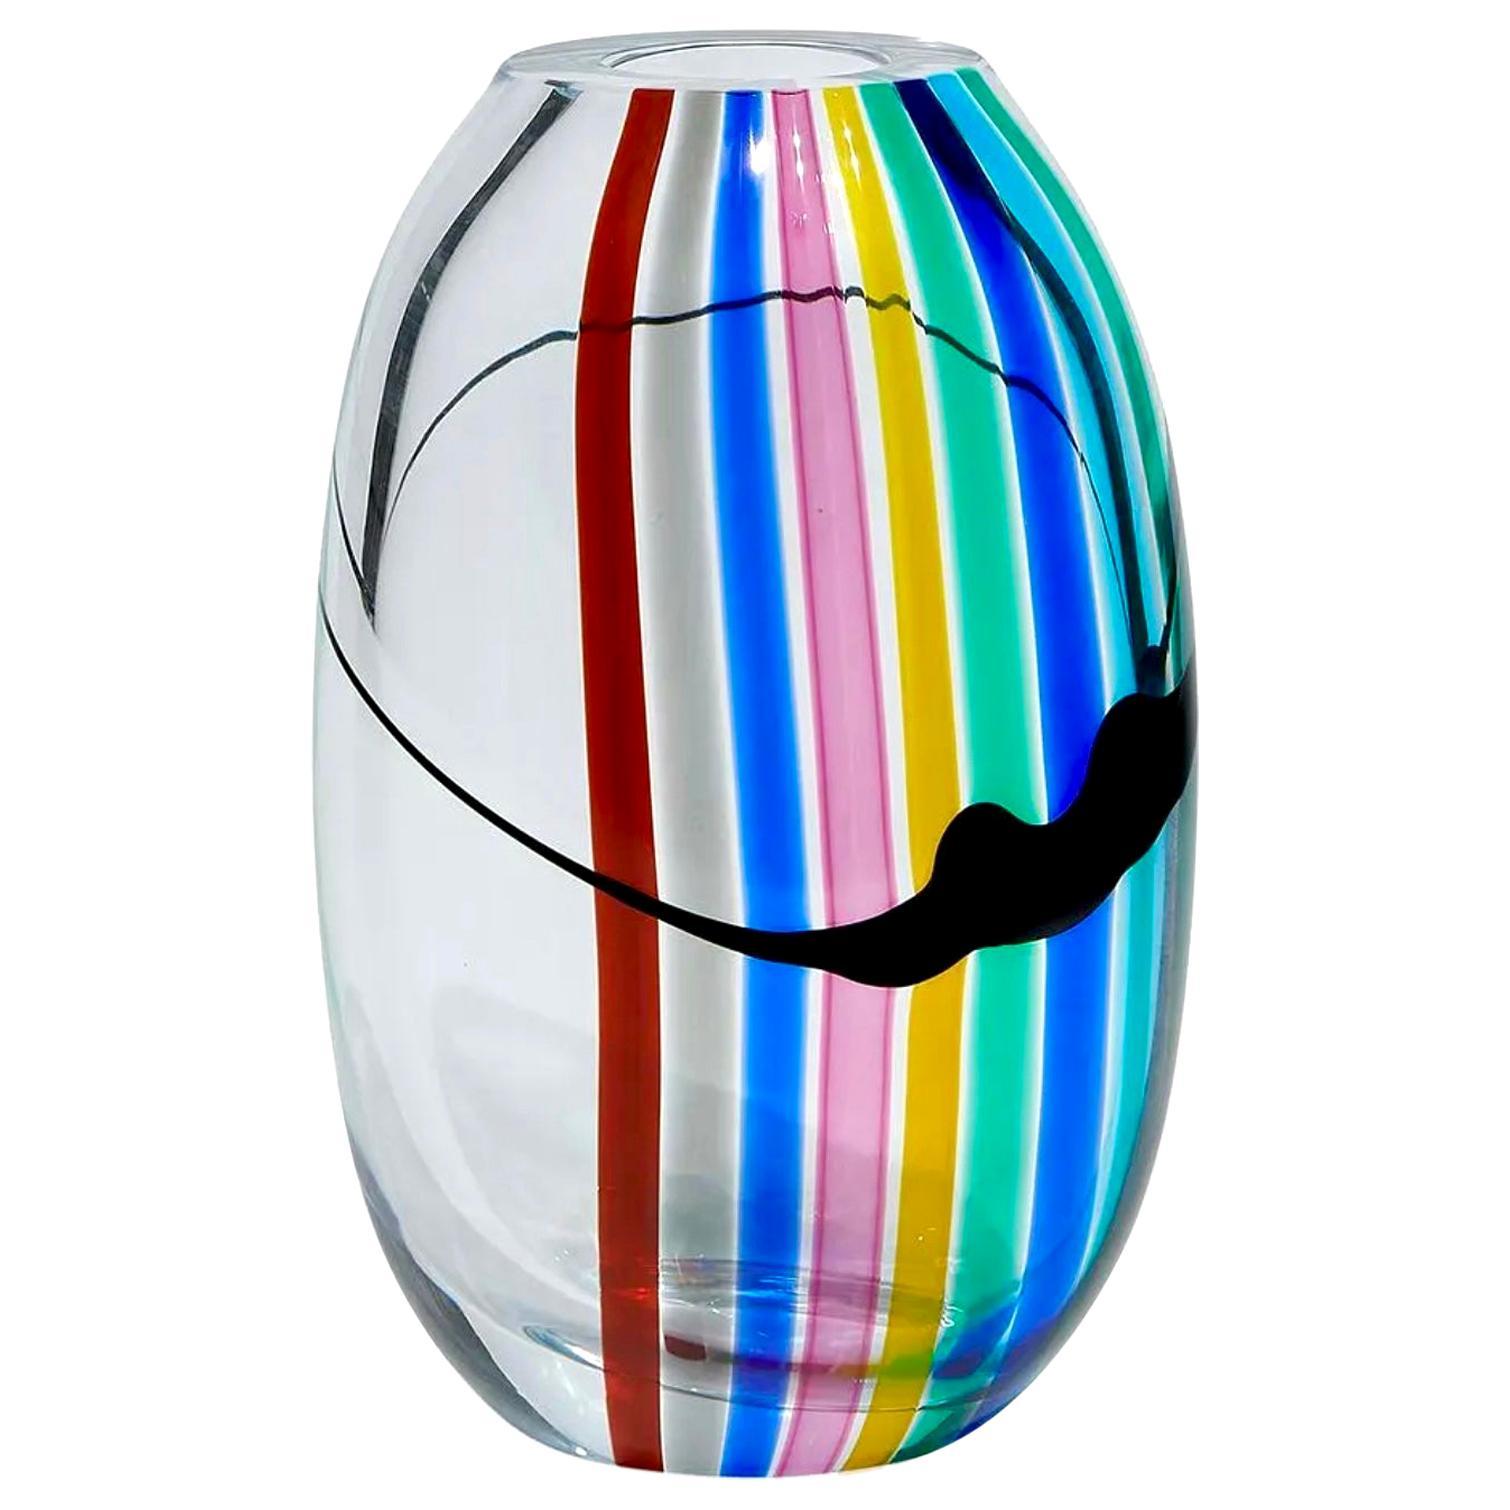 Livio Seguso for Seguso AV / Oggetti Rainbow Vase, Murano Glass, Italy, 1970s